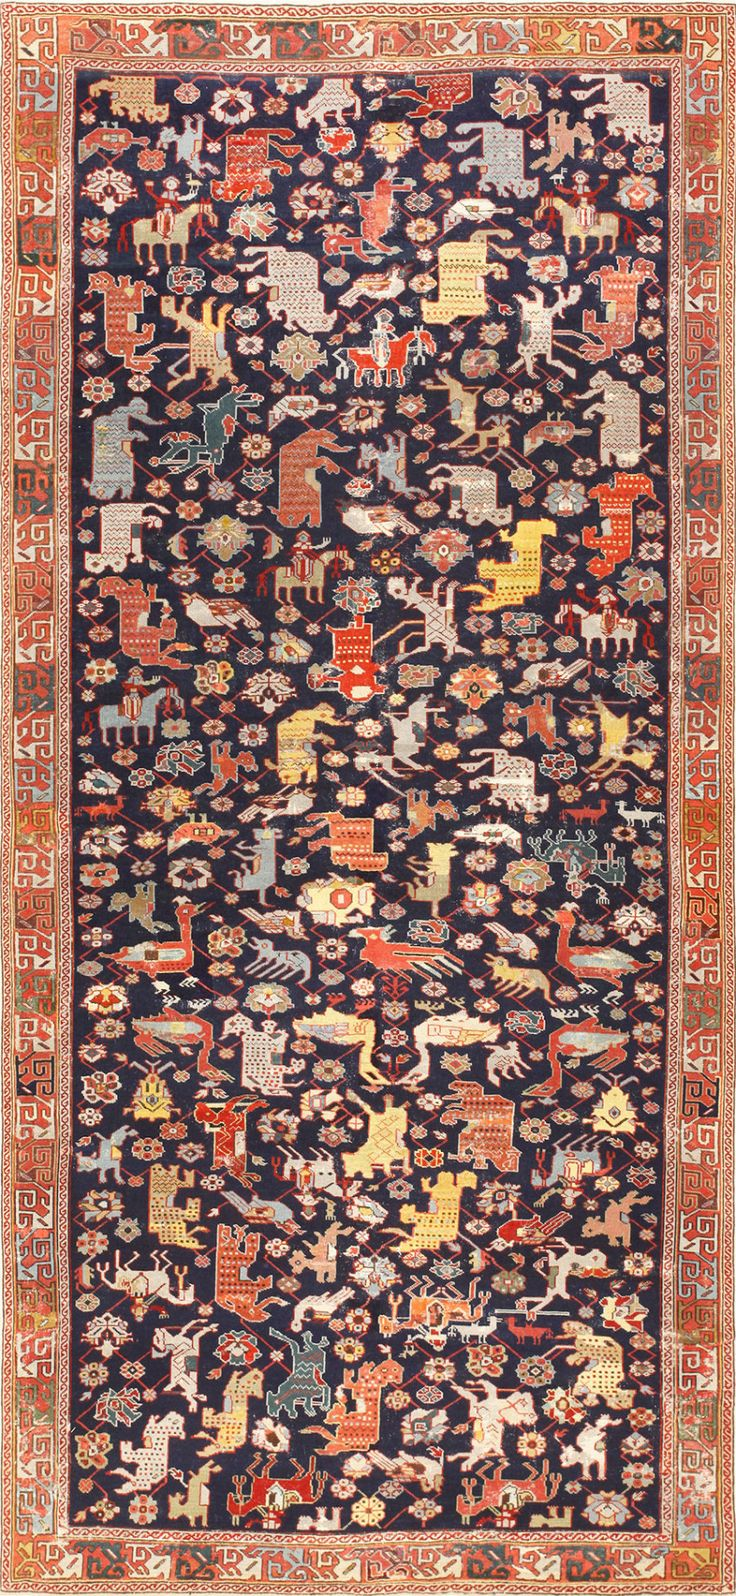 37 best Antique Carpets of the Caucasus images on Pinterest ... for Aladdin Carpet Design  75sfw